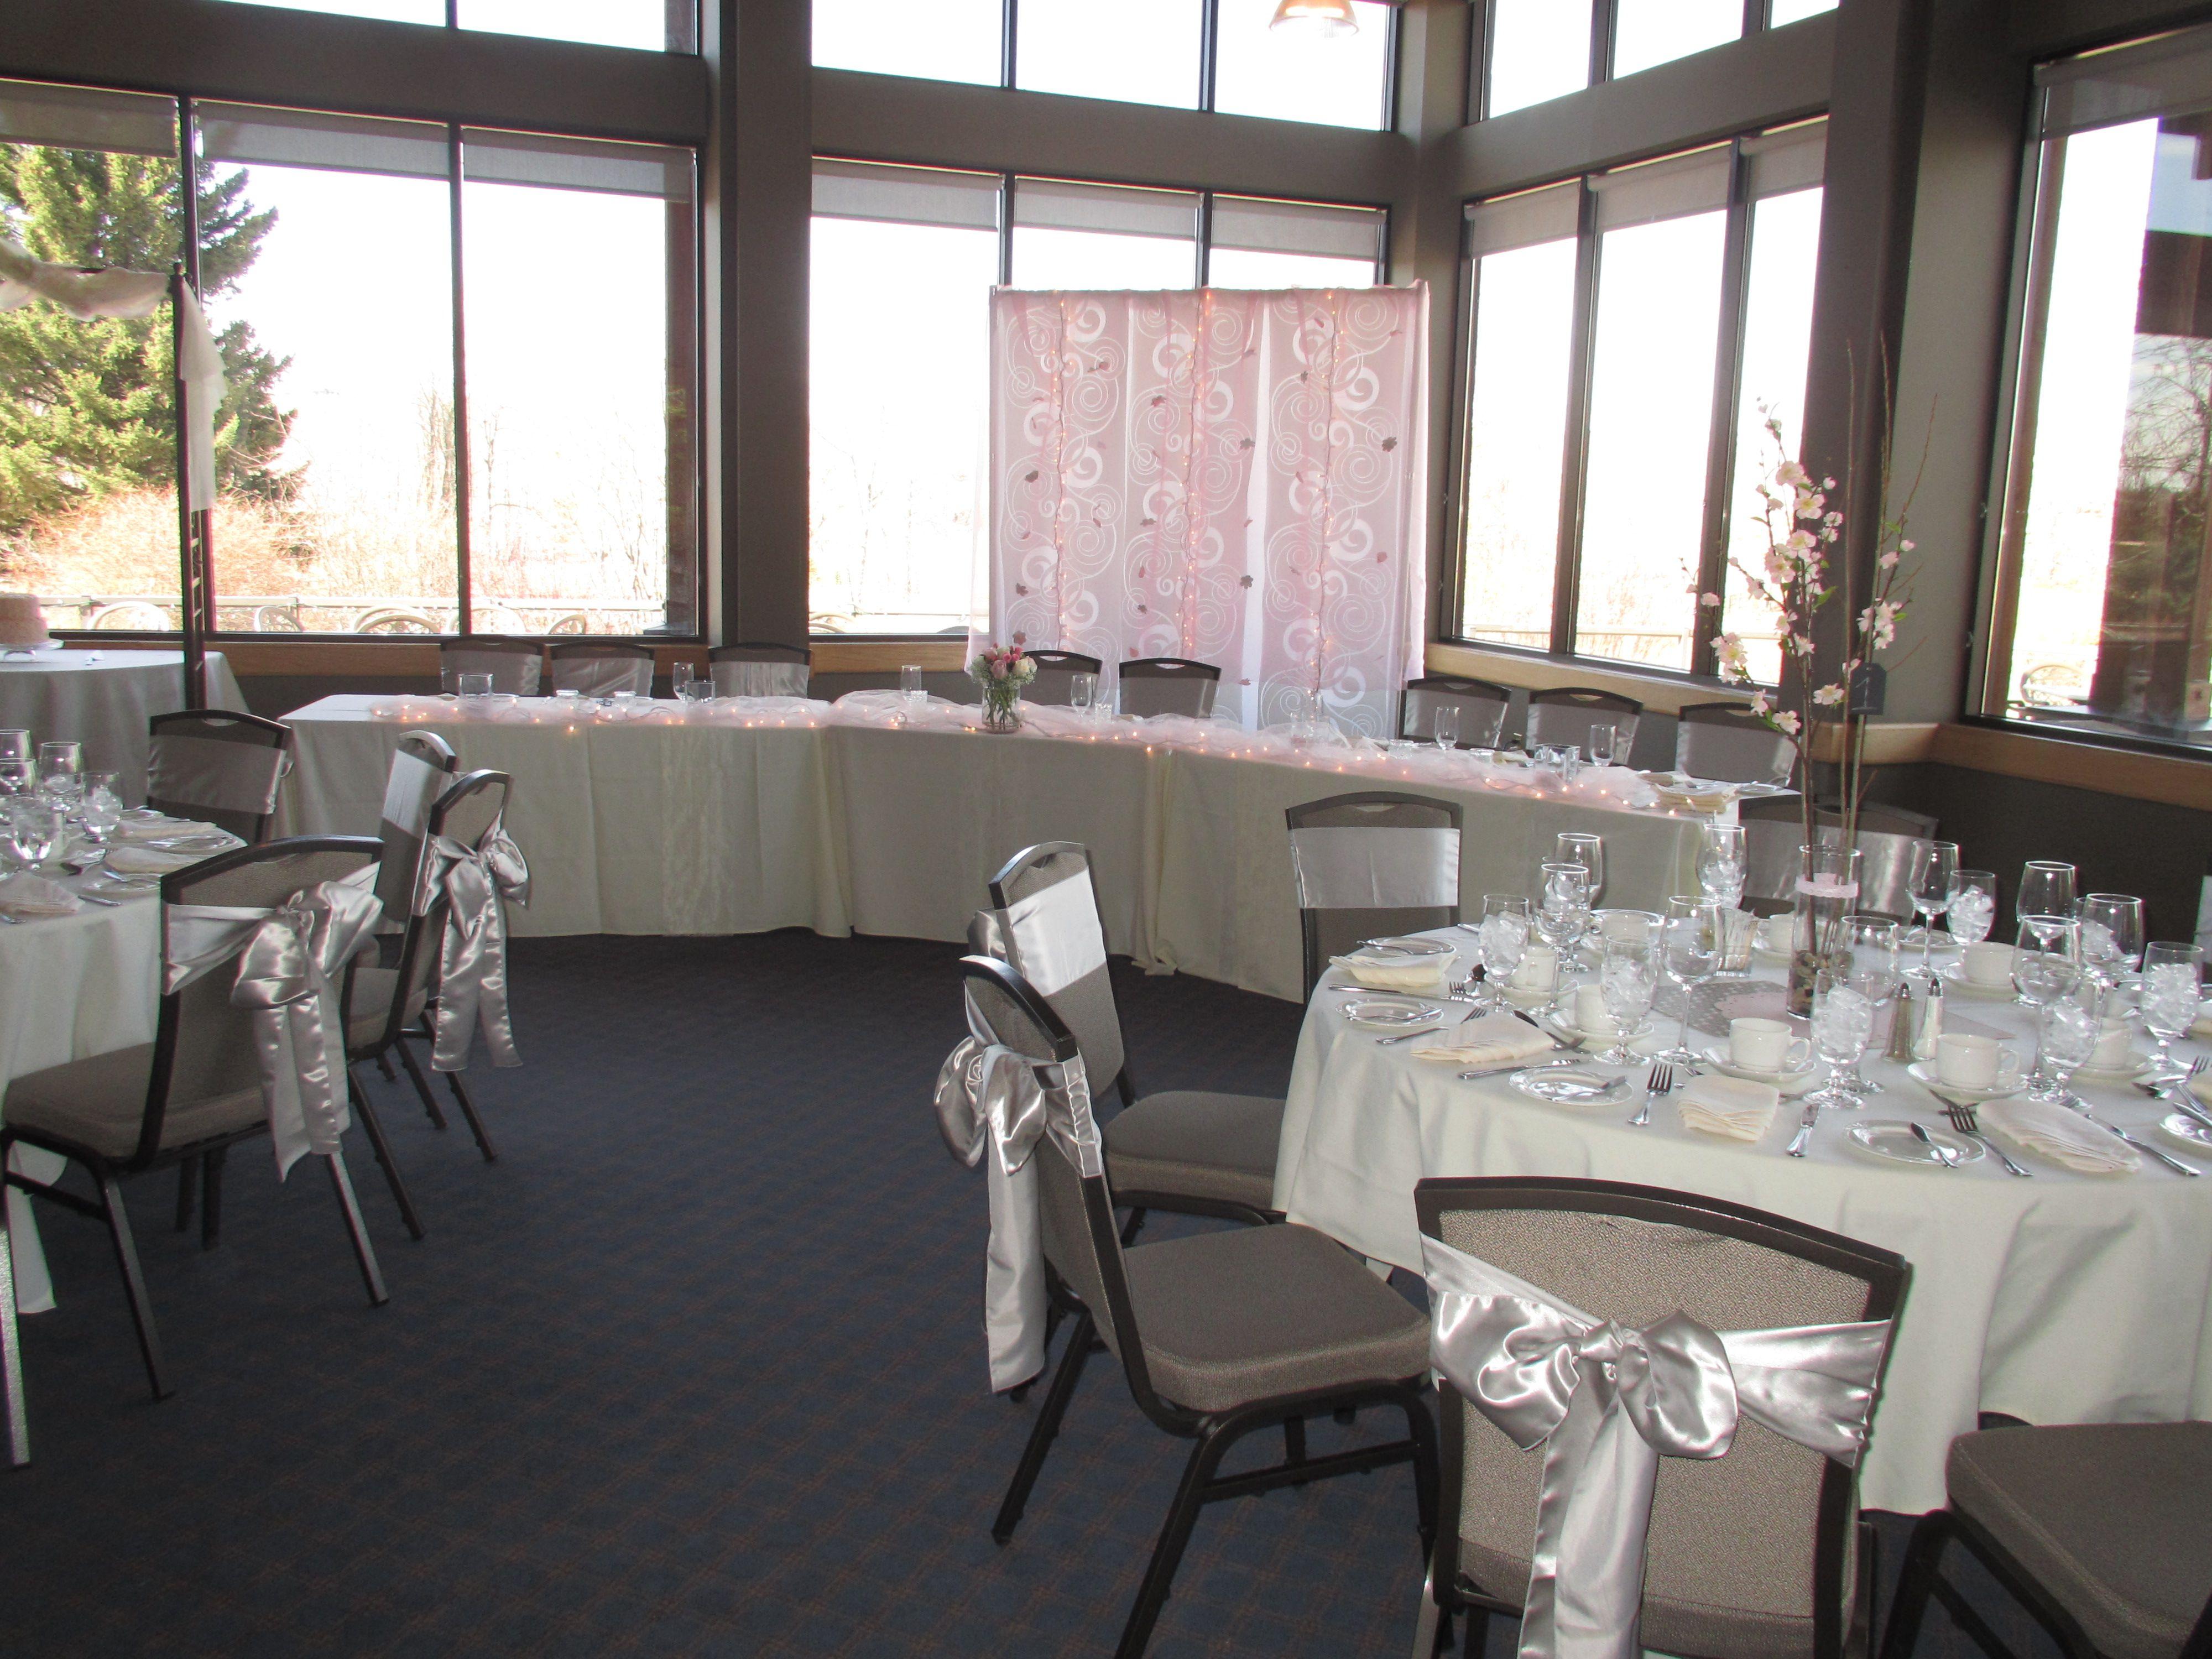 Head Table Www Valleyridgegolf Com Valley Ridge Golf Club Calgary Ab Table Head Table Home Decor